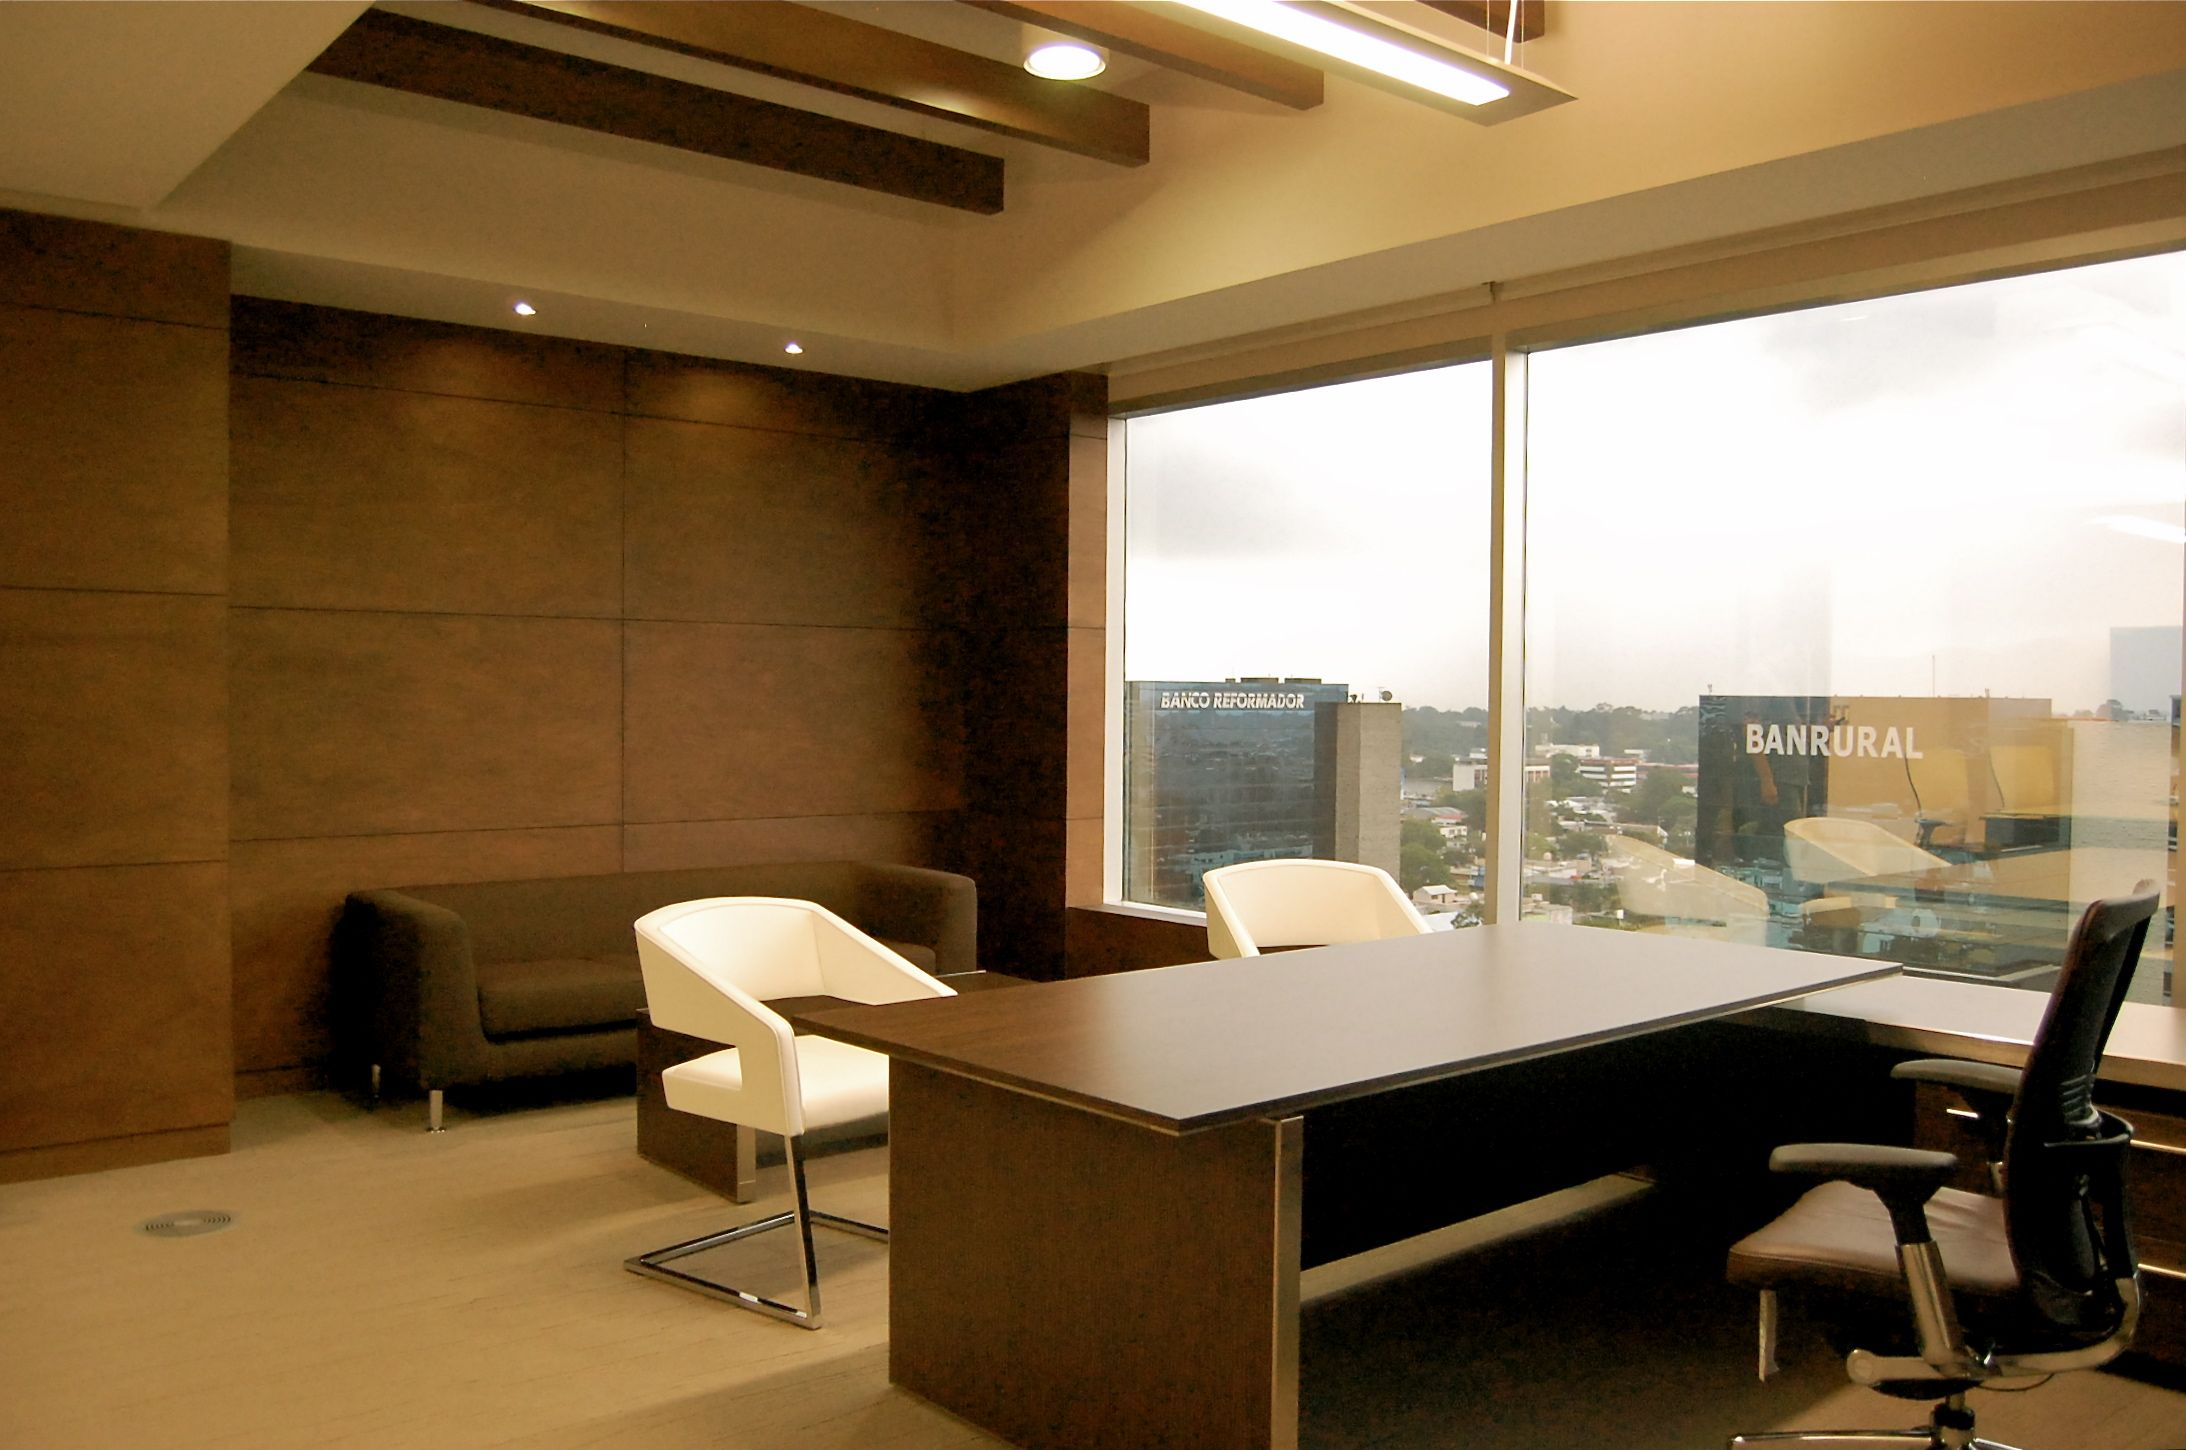 Executive office interior design new ideas home decor - Office furniture interior design ...